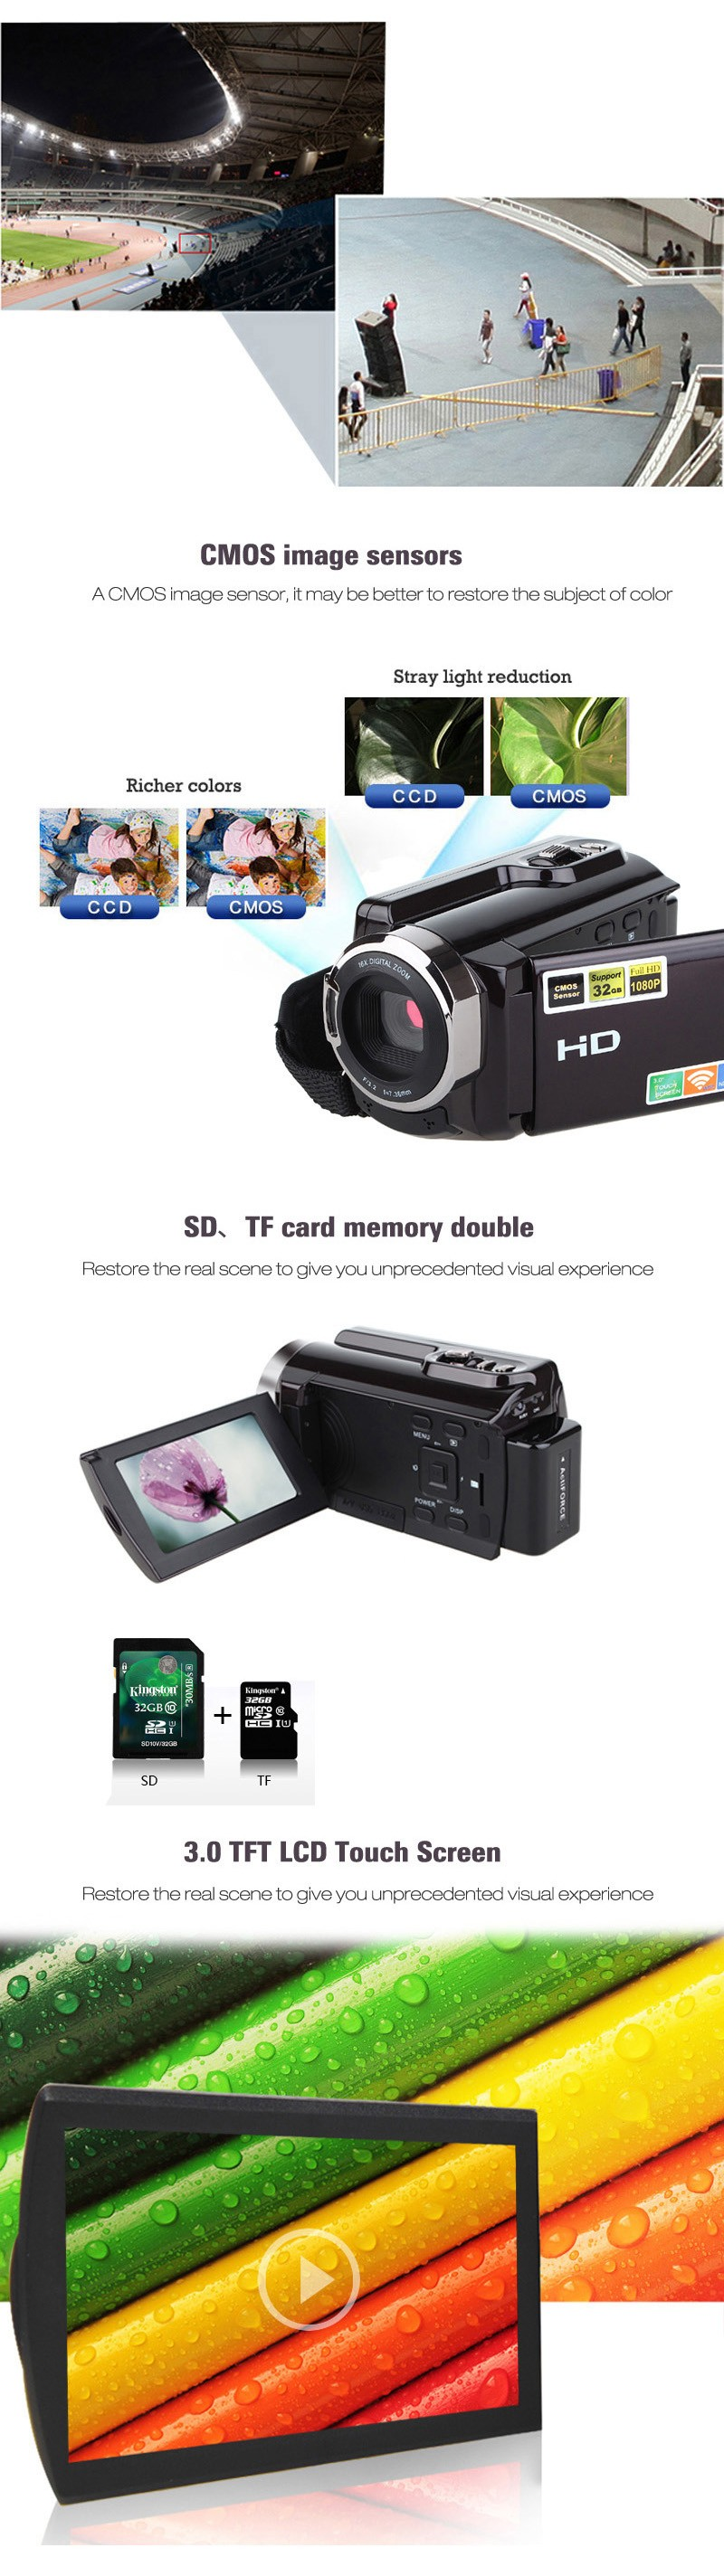 HDV-5053STR נייד מצלמת וידאו Full HD 1080p 16x זום דיגיטלי מצלמת וידאו דיגיטלית מקליט DVR עם Wifi מקס.20MP מסך מגע